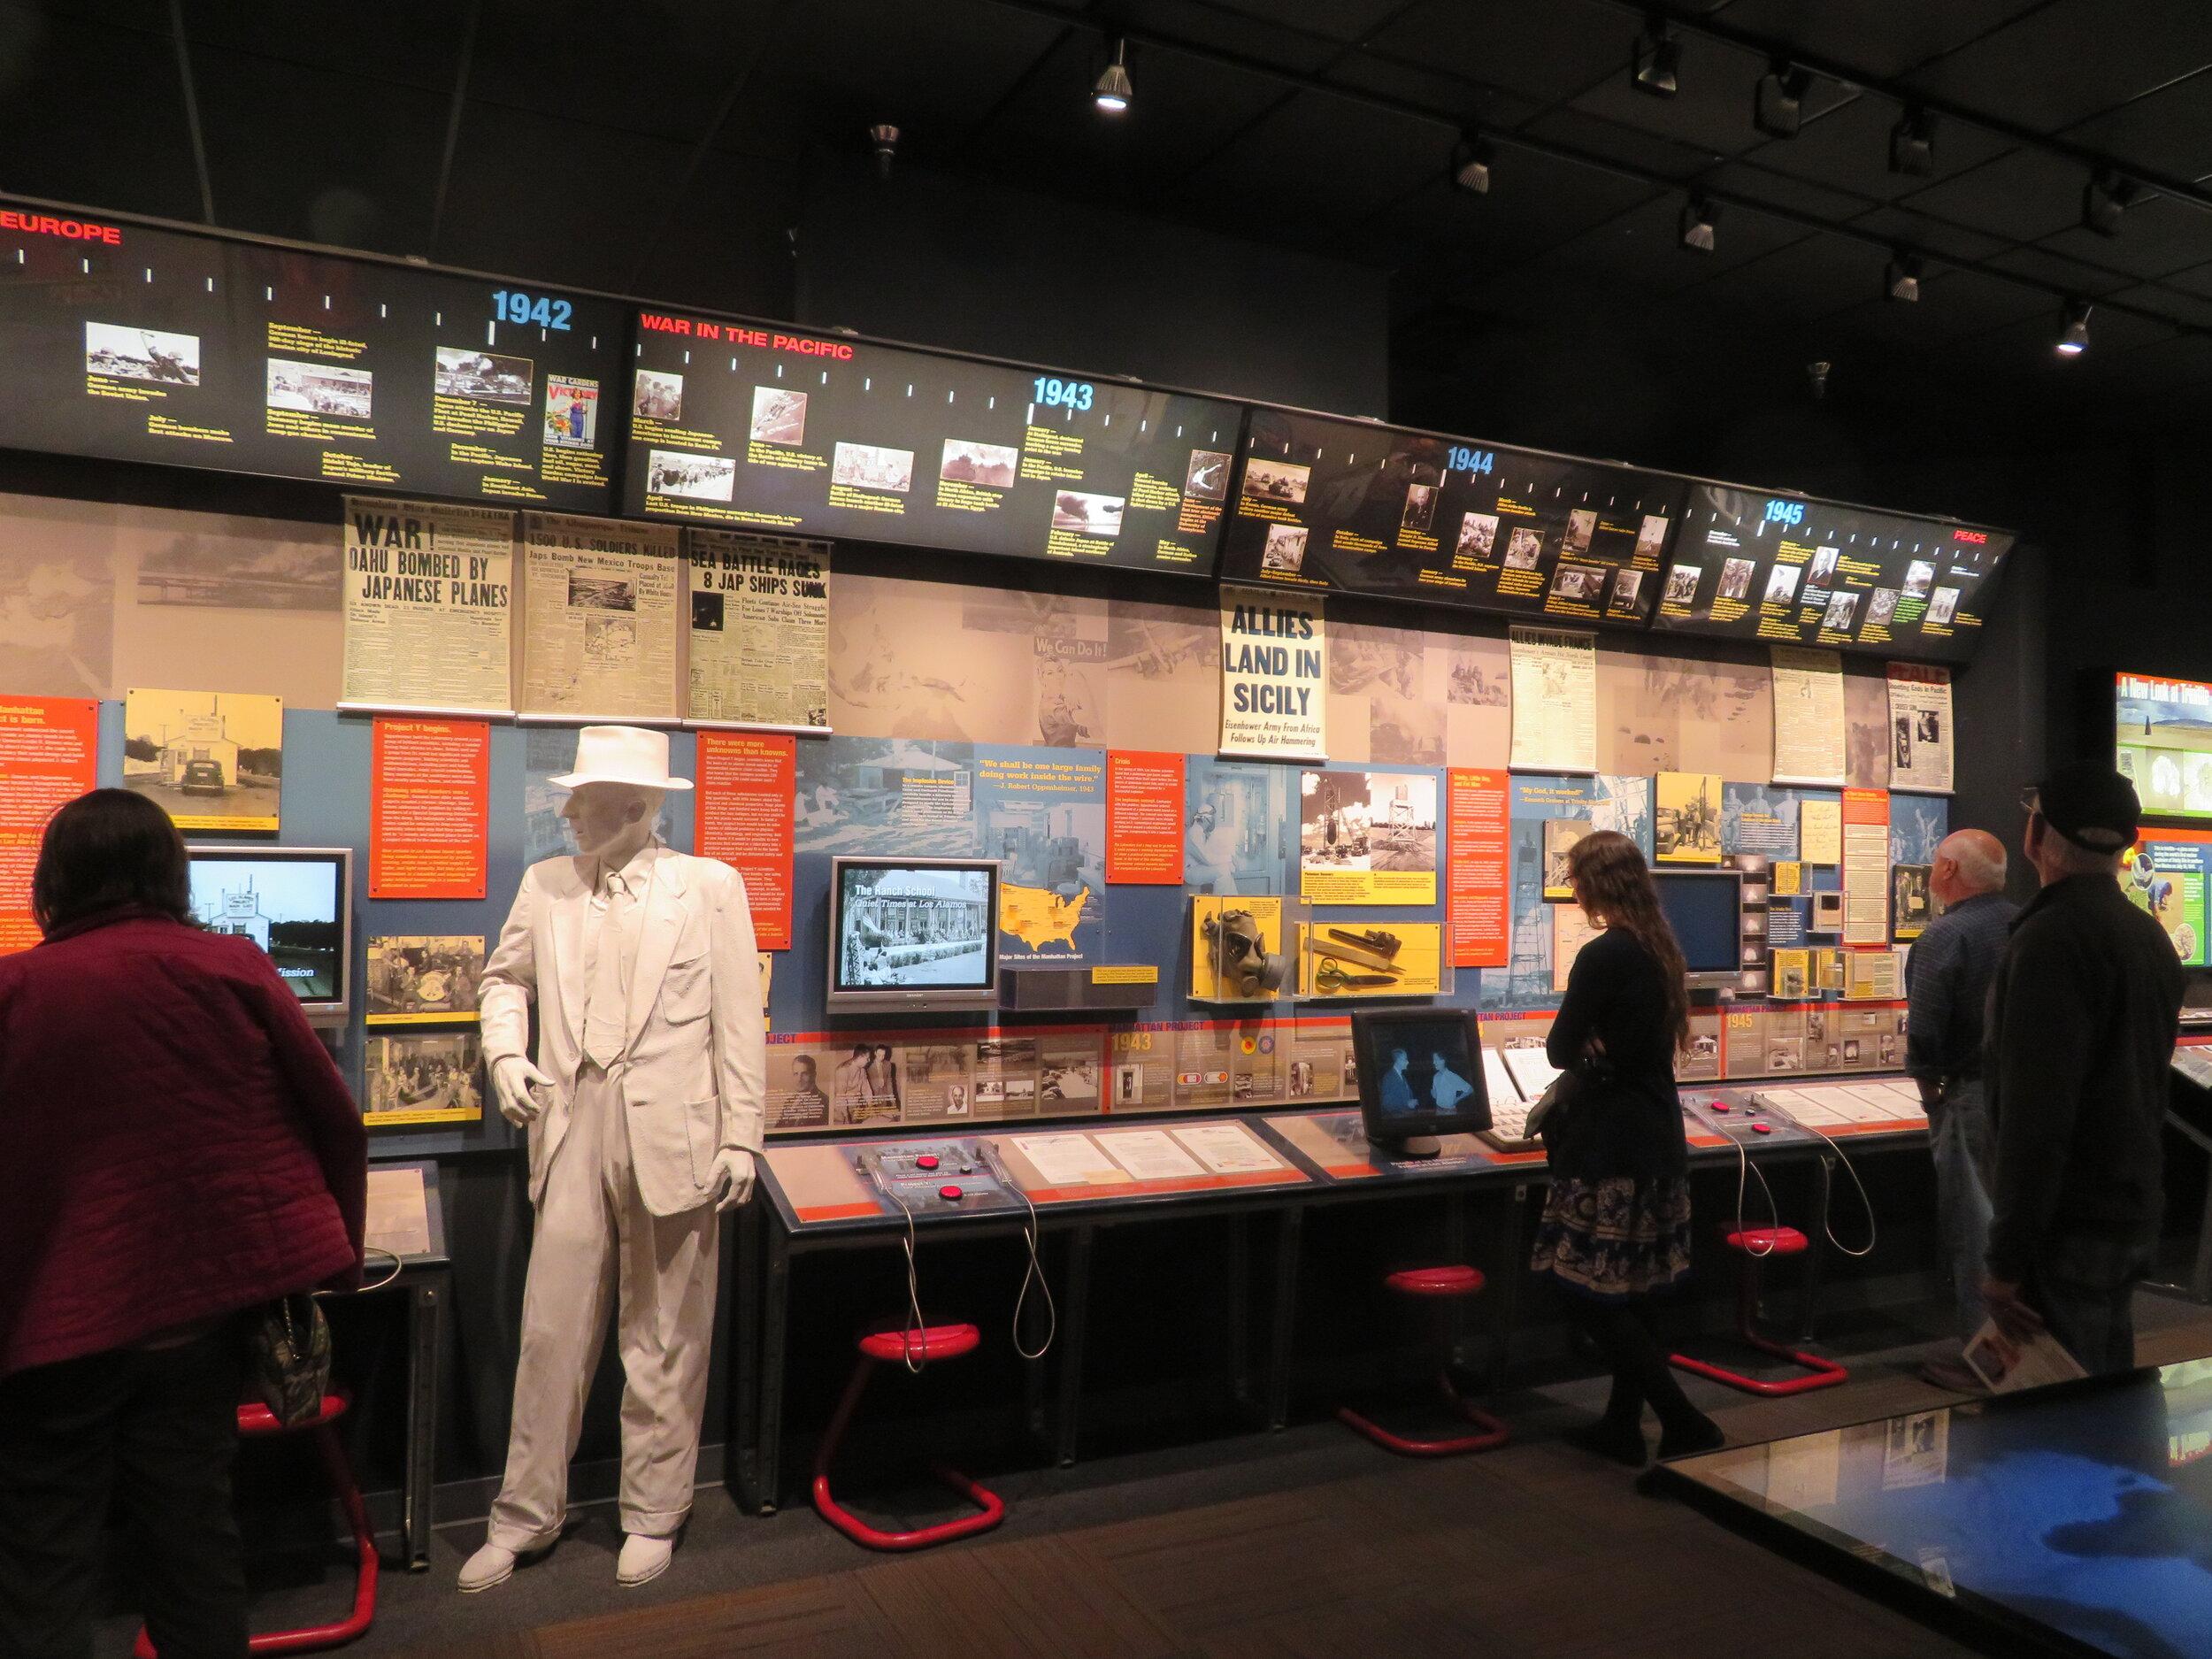 Manhattan Project Display